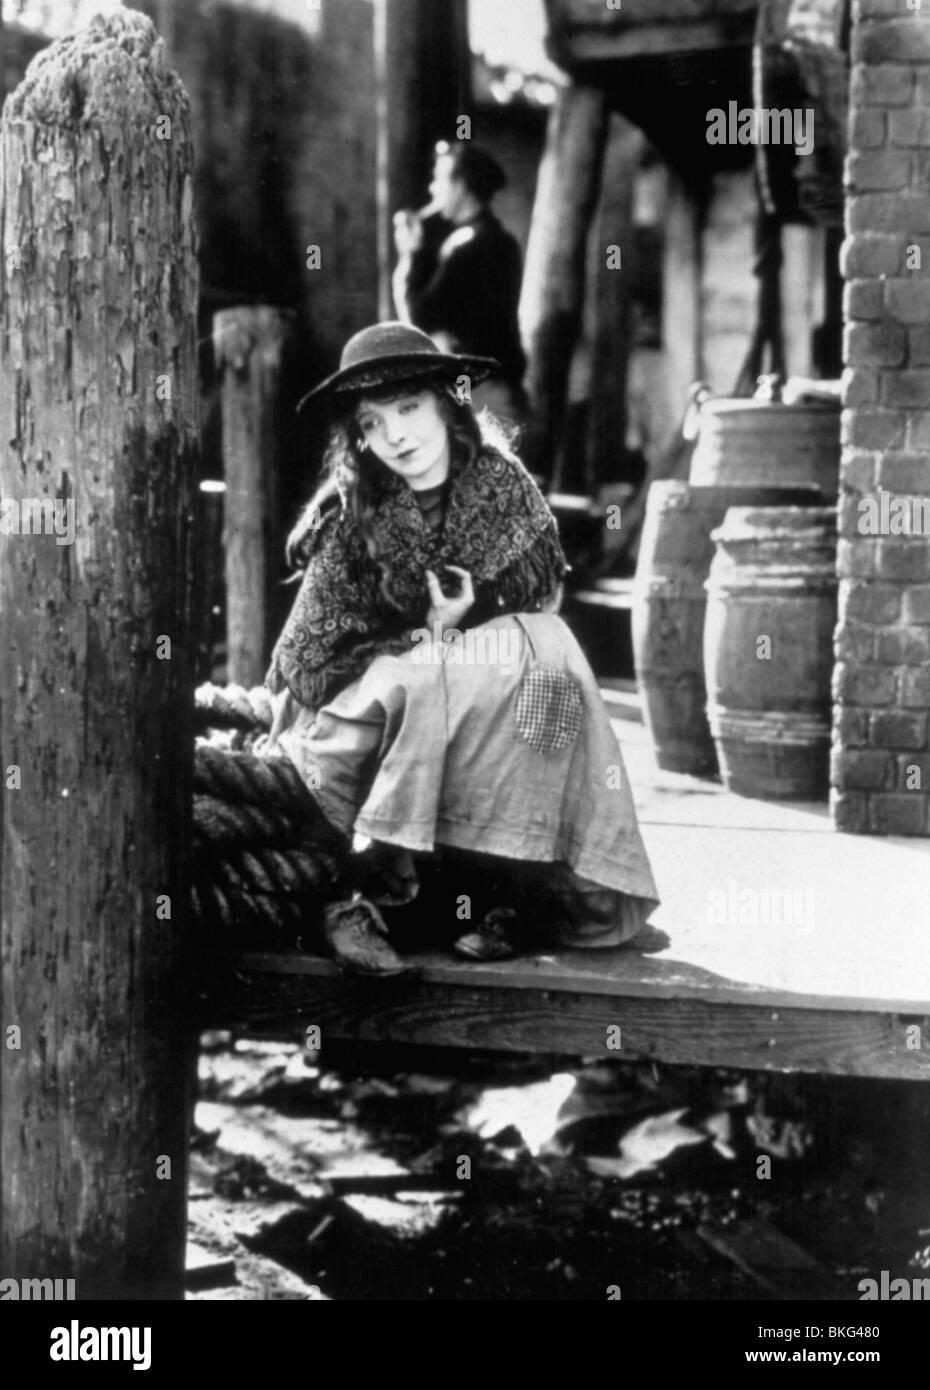 BROKEN BLOSSOMS (1919) LILLIAN GISH BKBL 001 - Stock Image